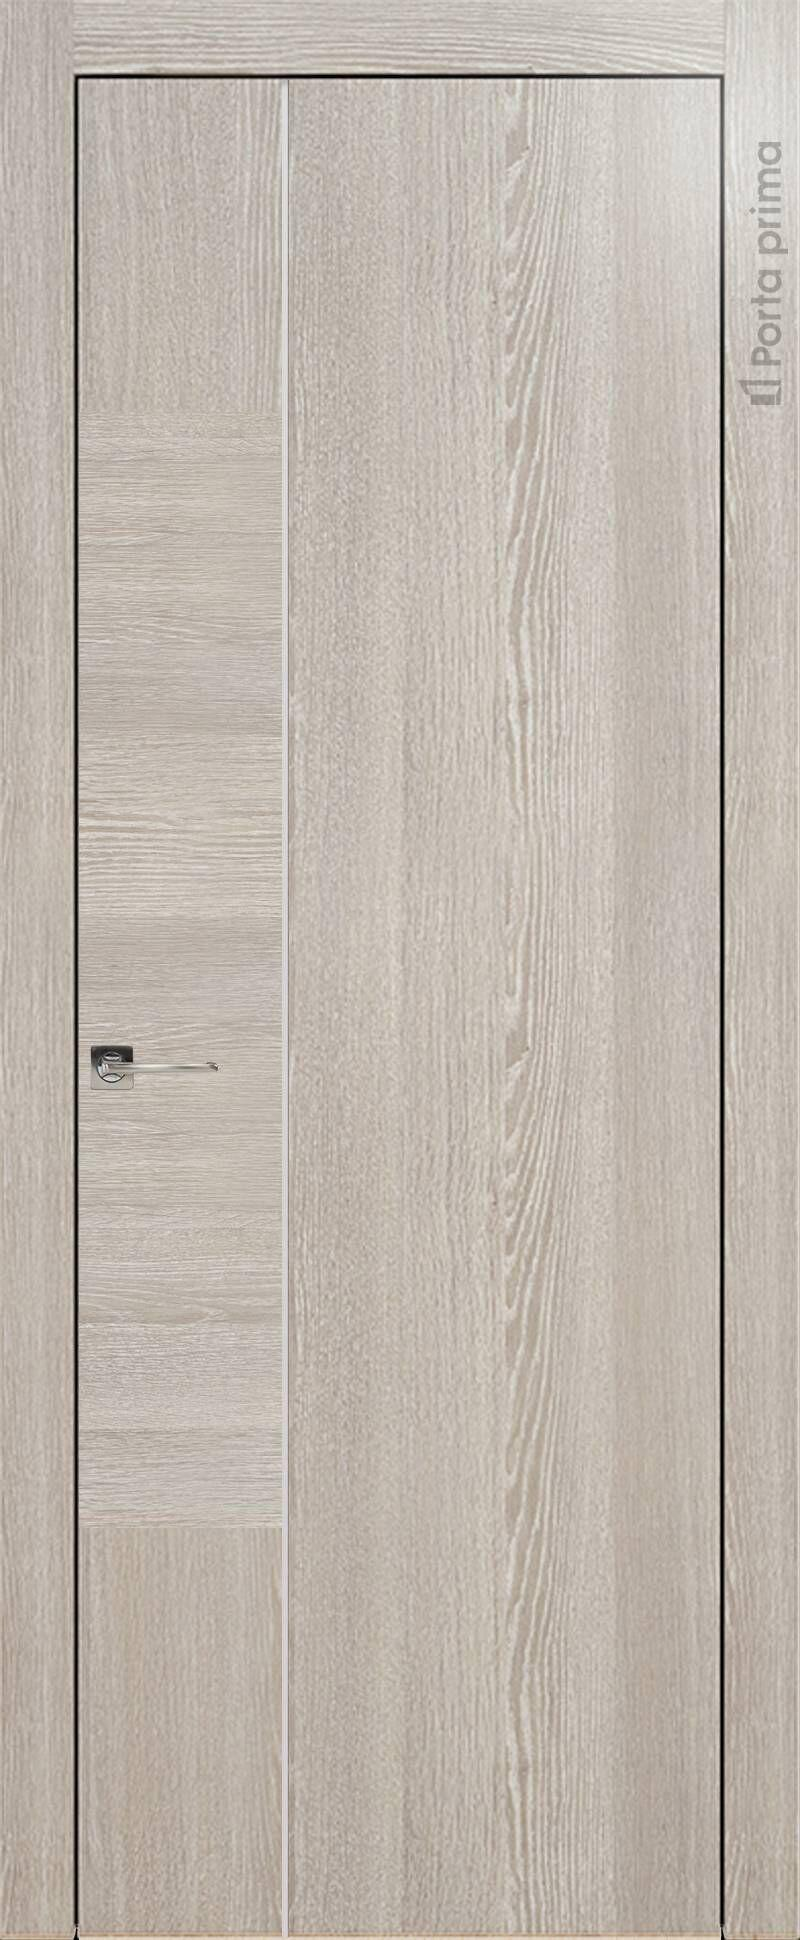 Tivoli В-1 цвет - Серый дуб Без стекла (ДГ)